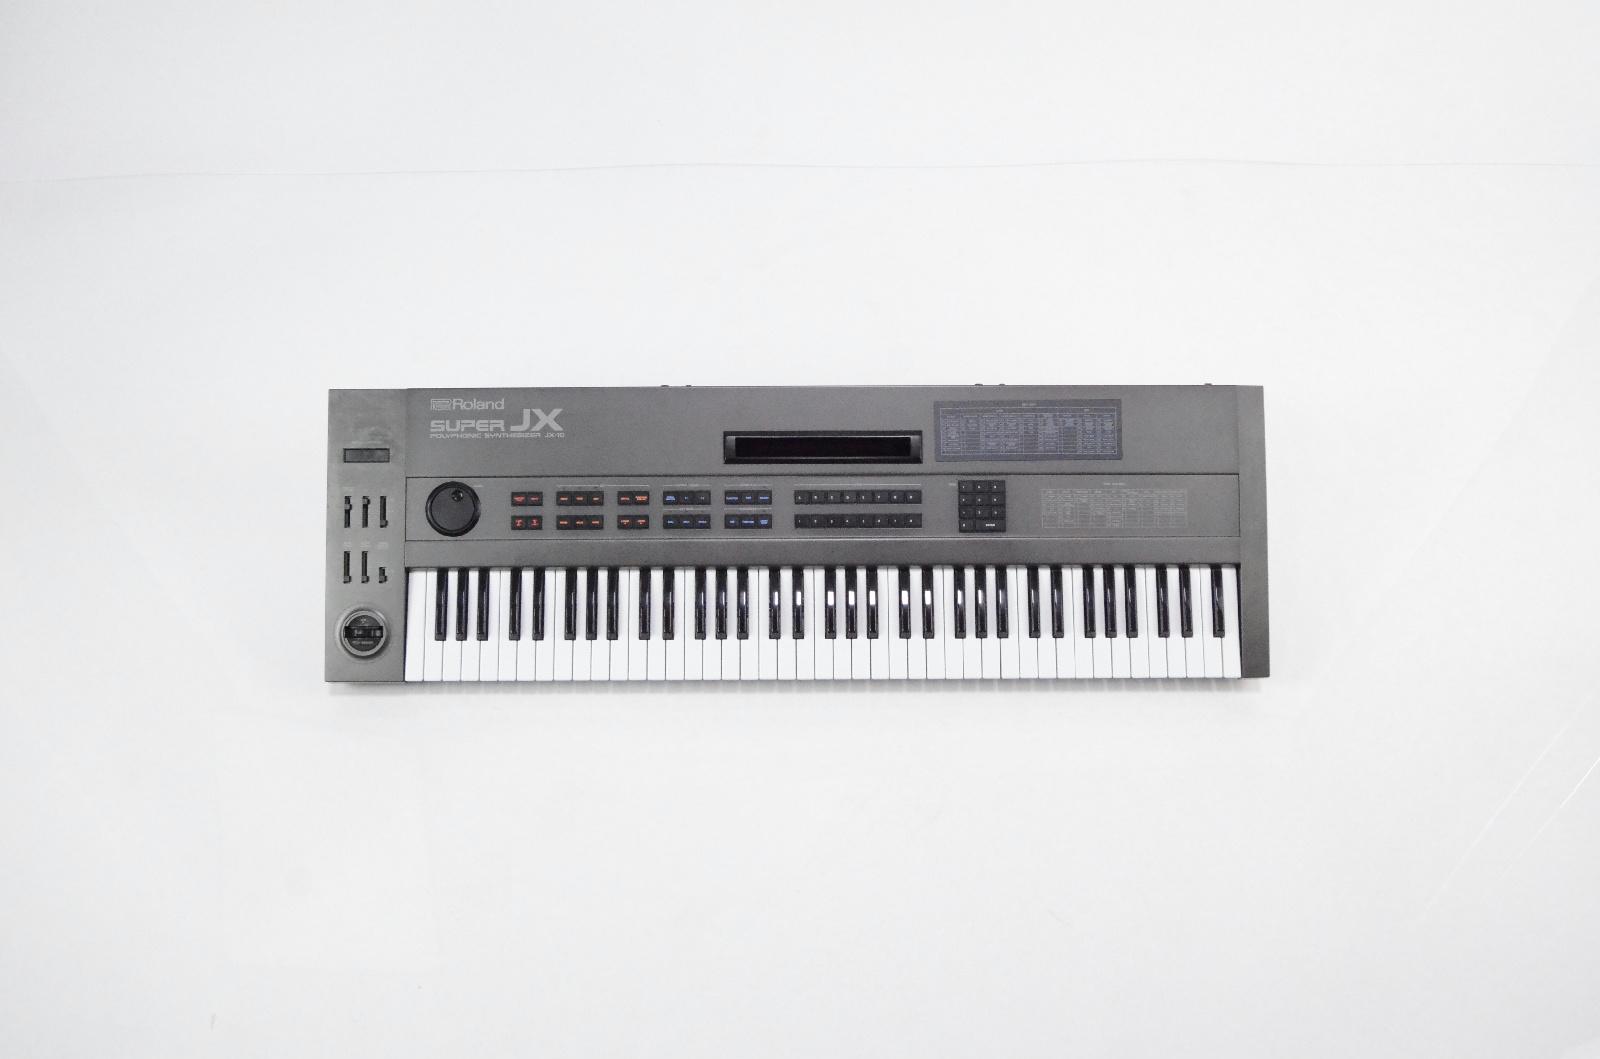 Roland Super JX Polyphonic Synthesizer JX-10 Justin Meldal-Johnsen #32879